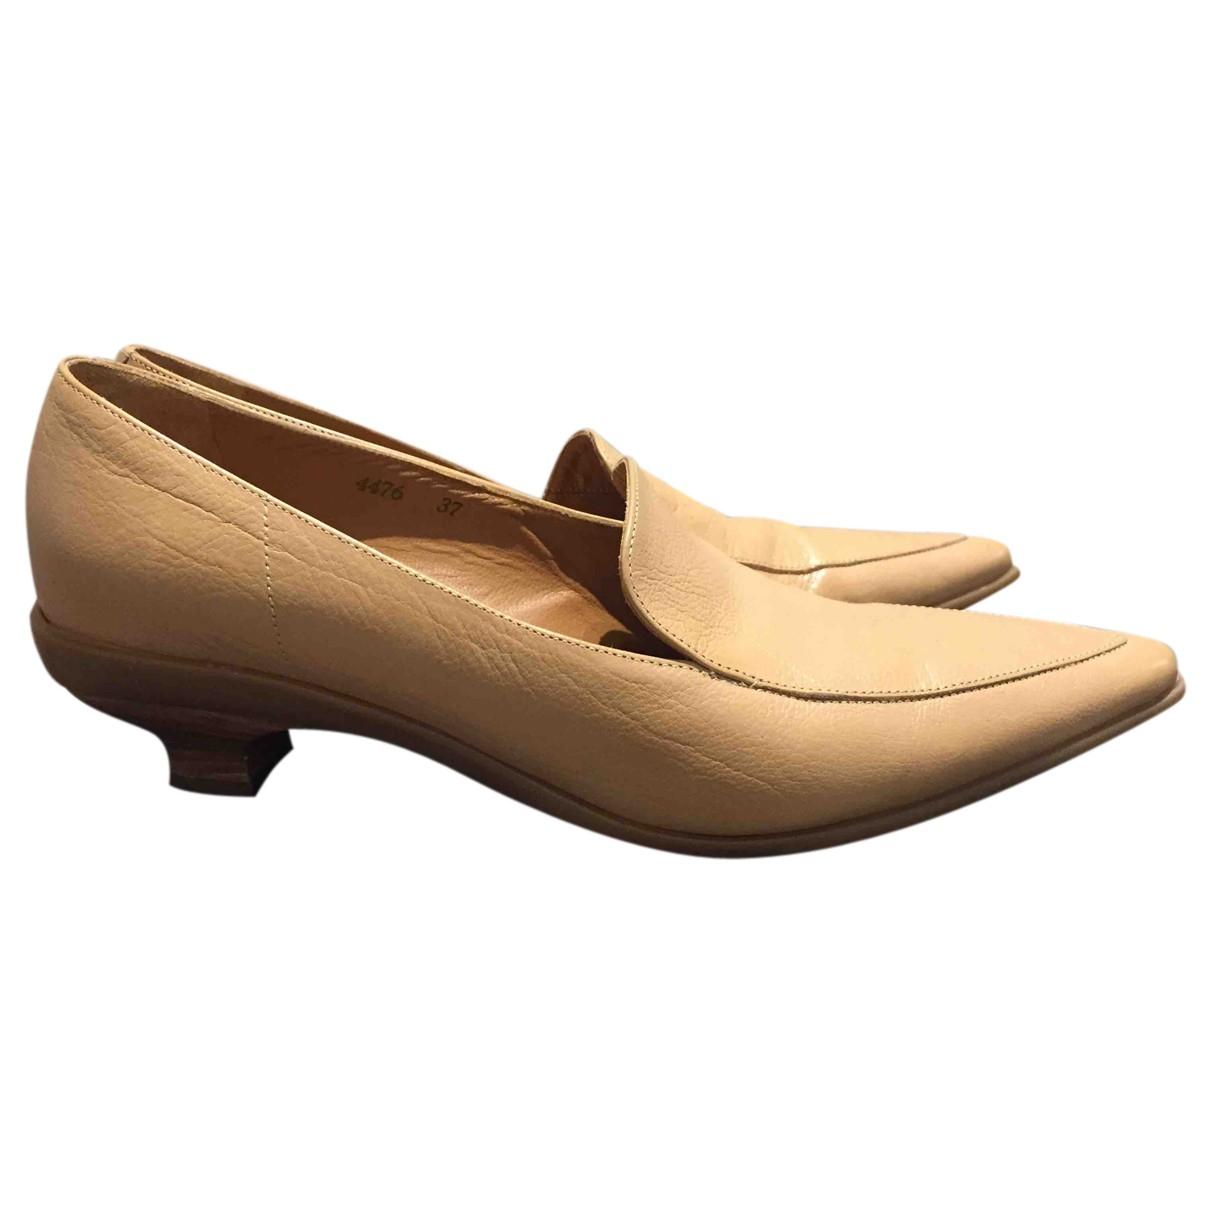 Vic Matié N Beige Leather Flats for Women 37 IT